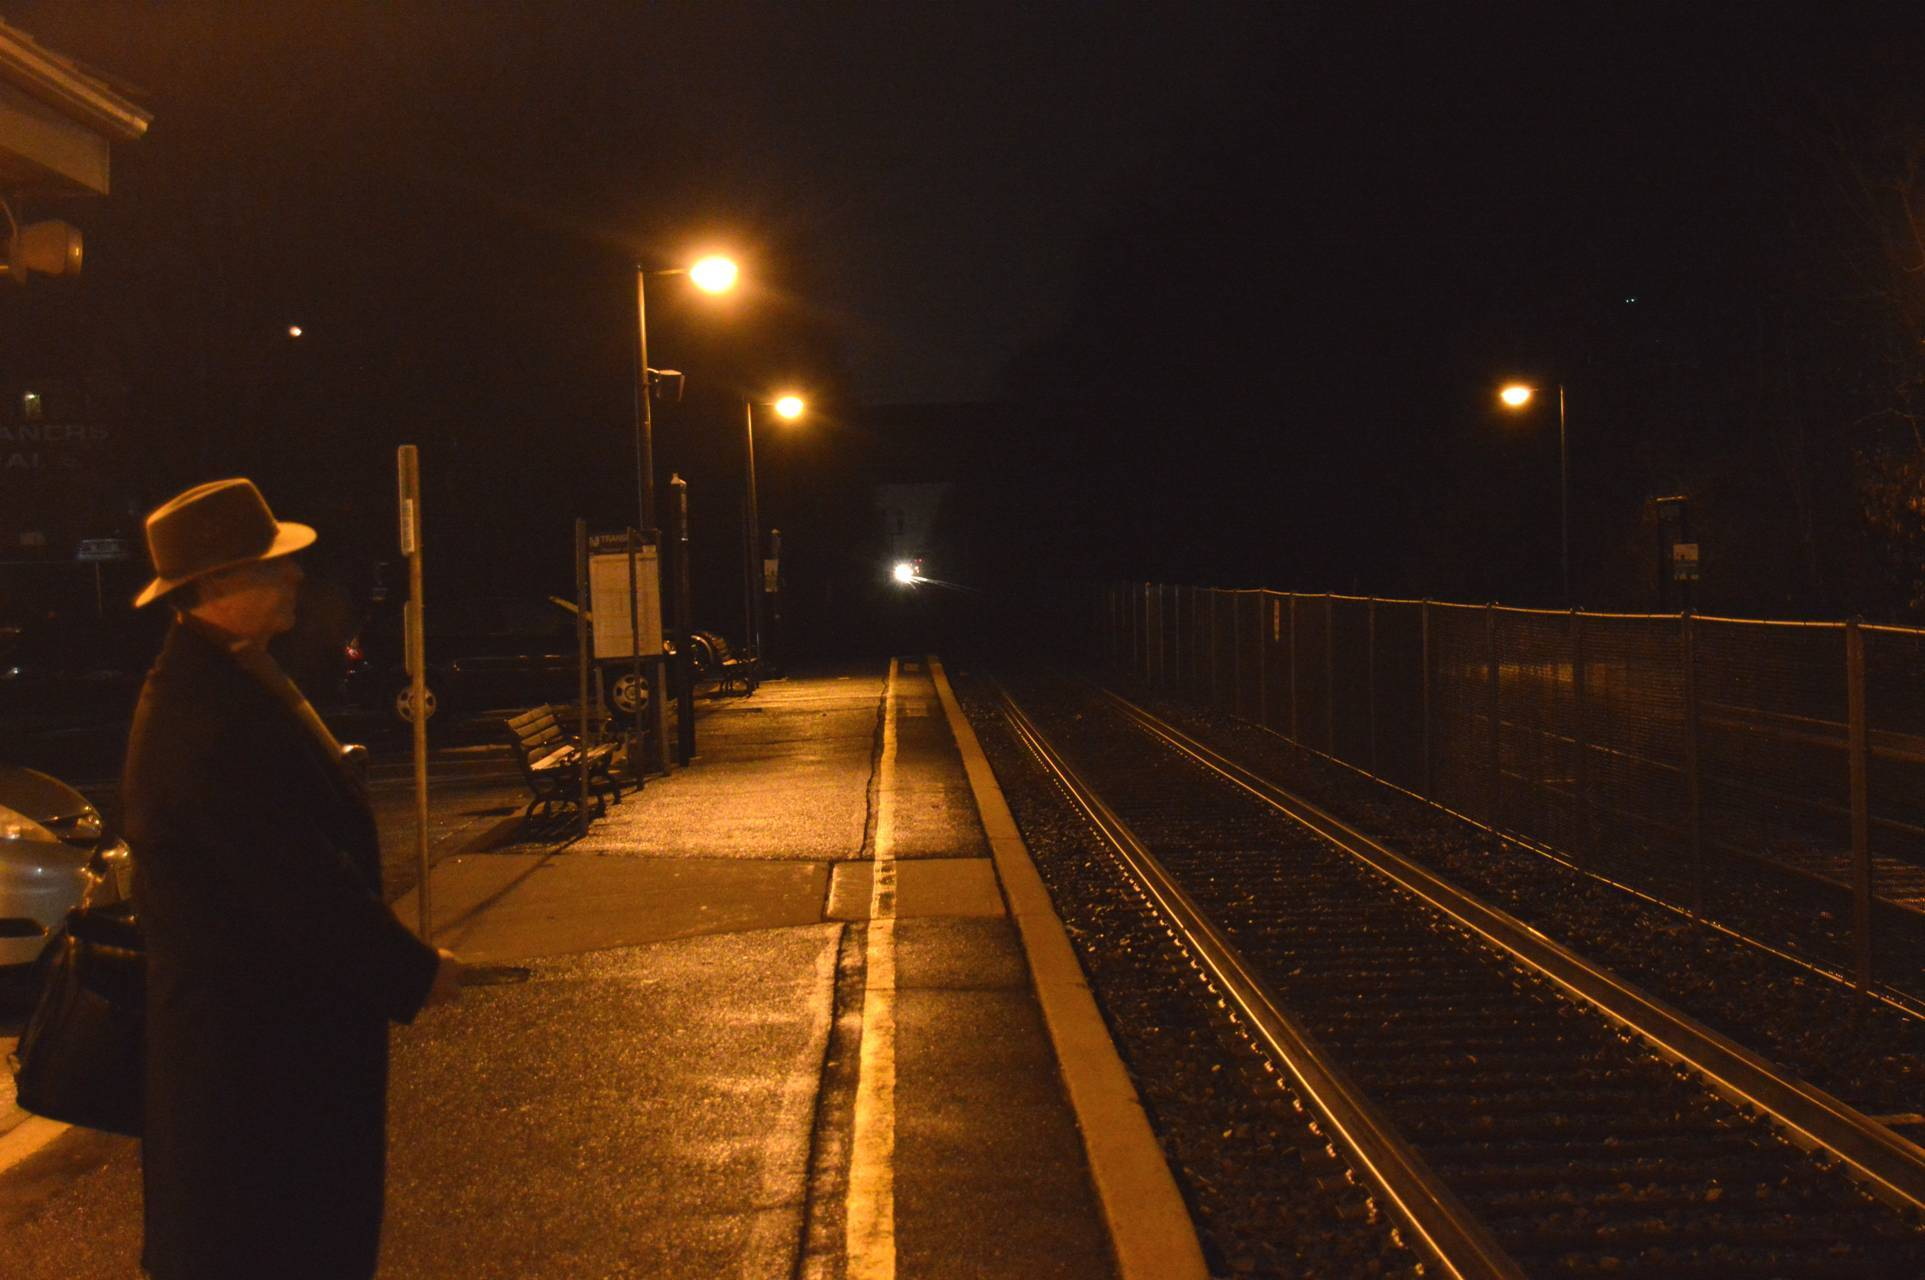 4d88c826b4932c2d823d_Awaiting_train.jpg